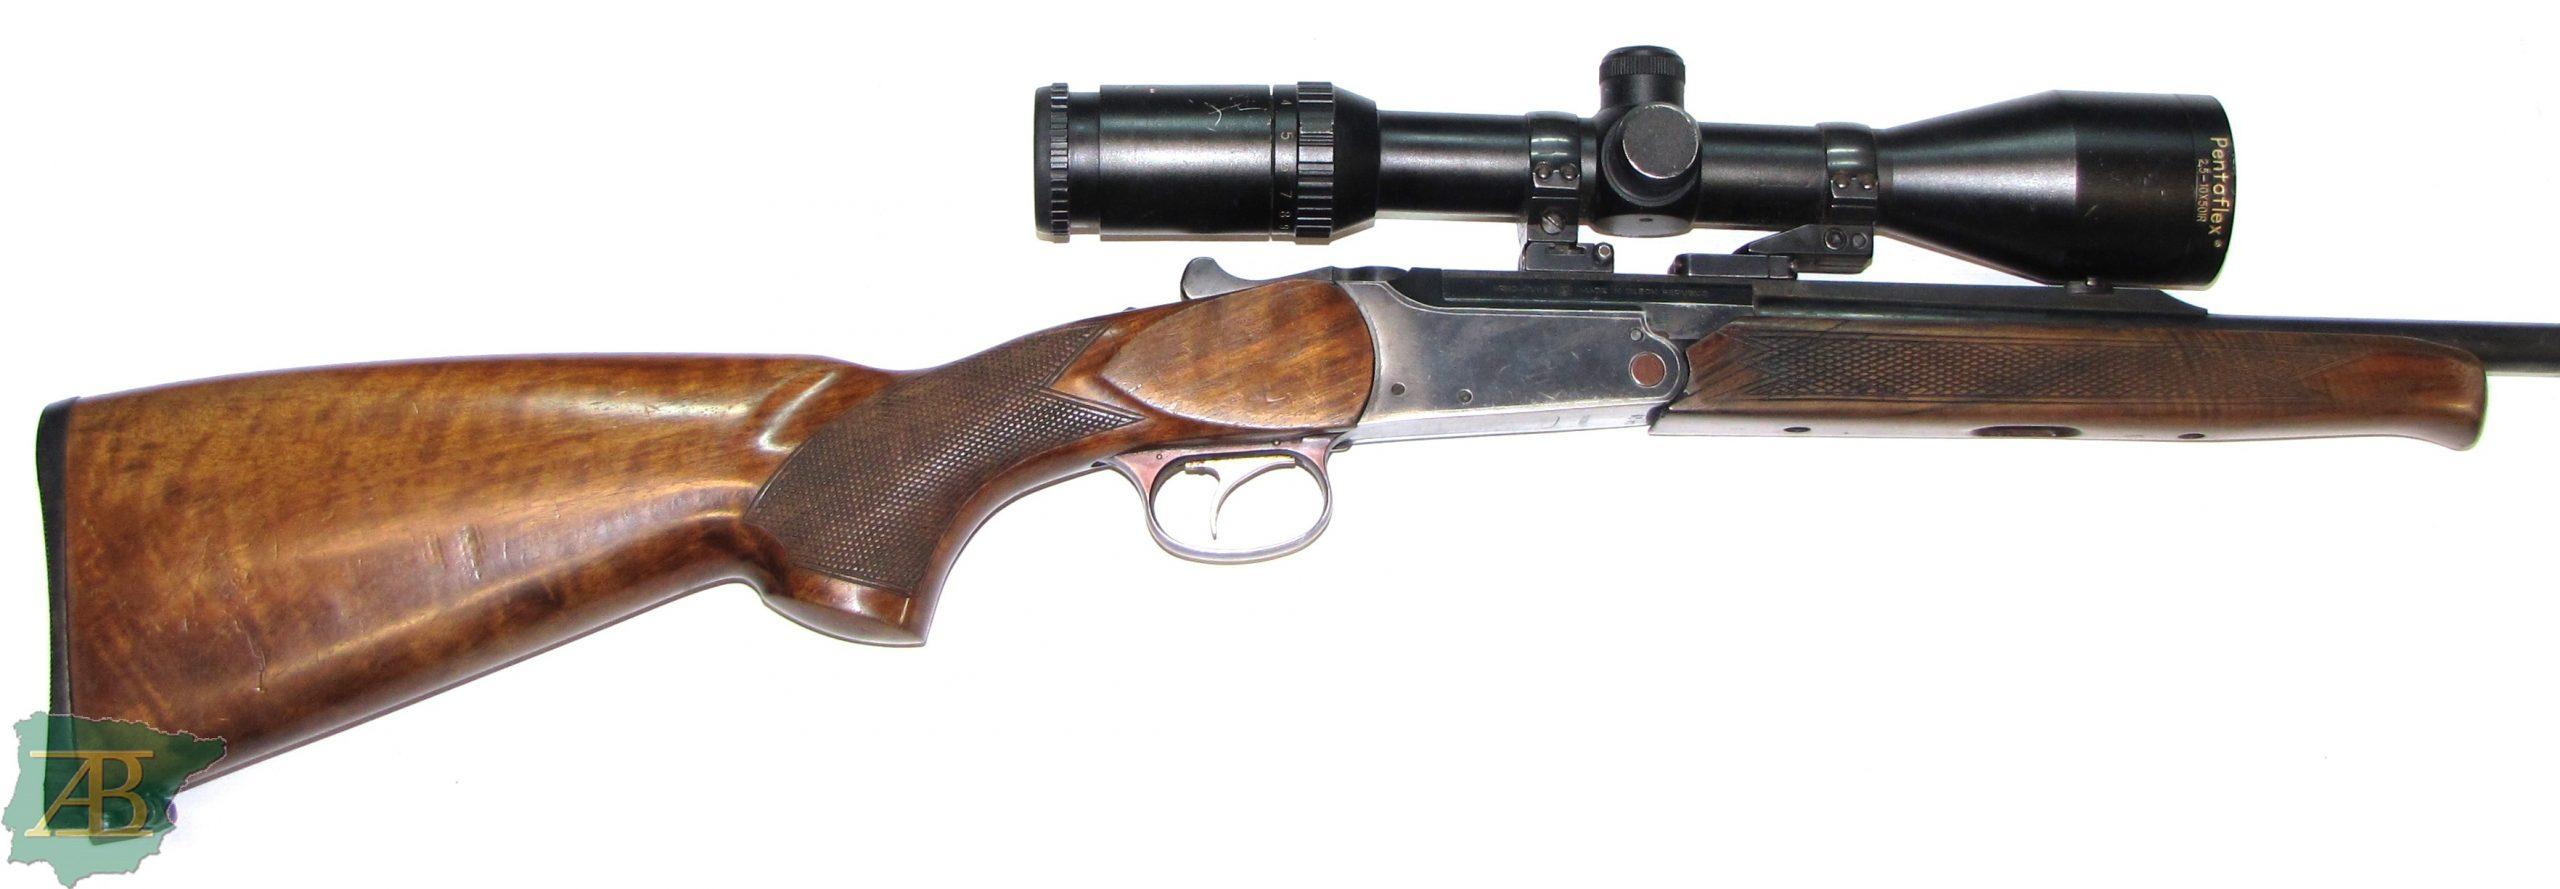 Rifle monotiro ZBROJOVKA BRNO ZK99-5 Ref REP2020-1092-armeriaiberica-2